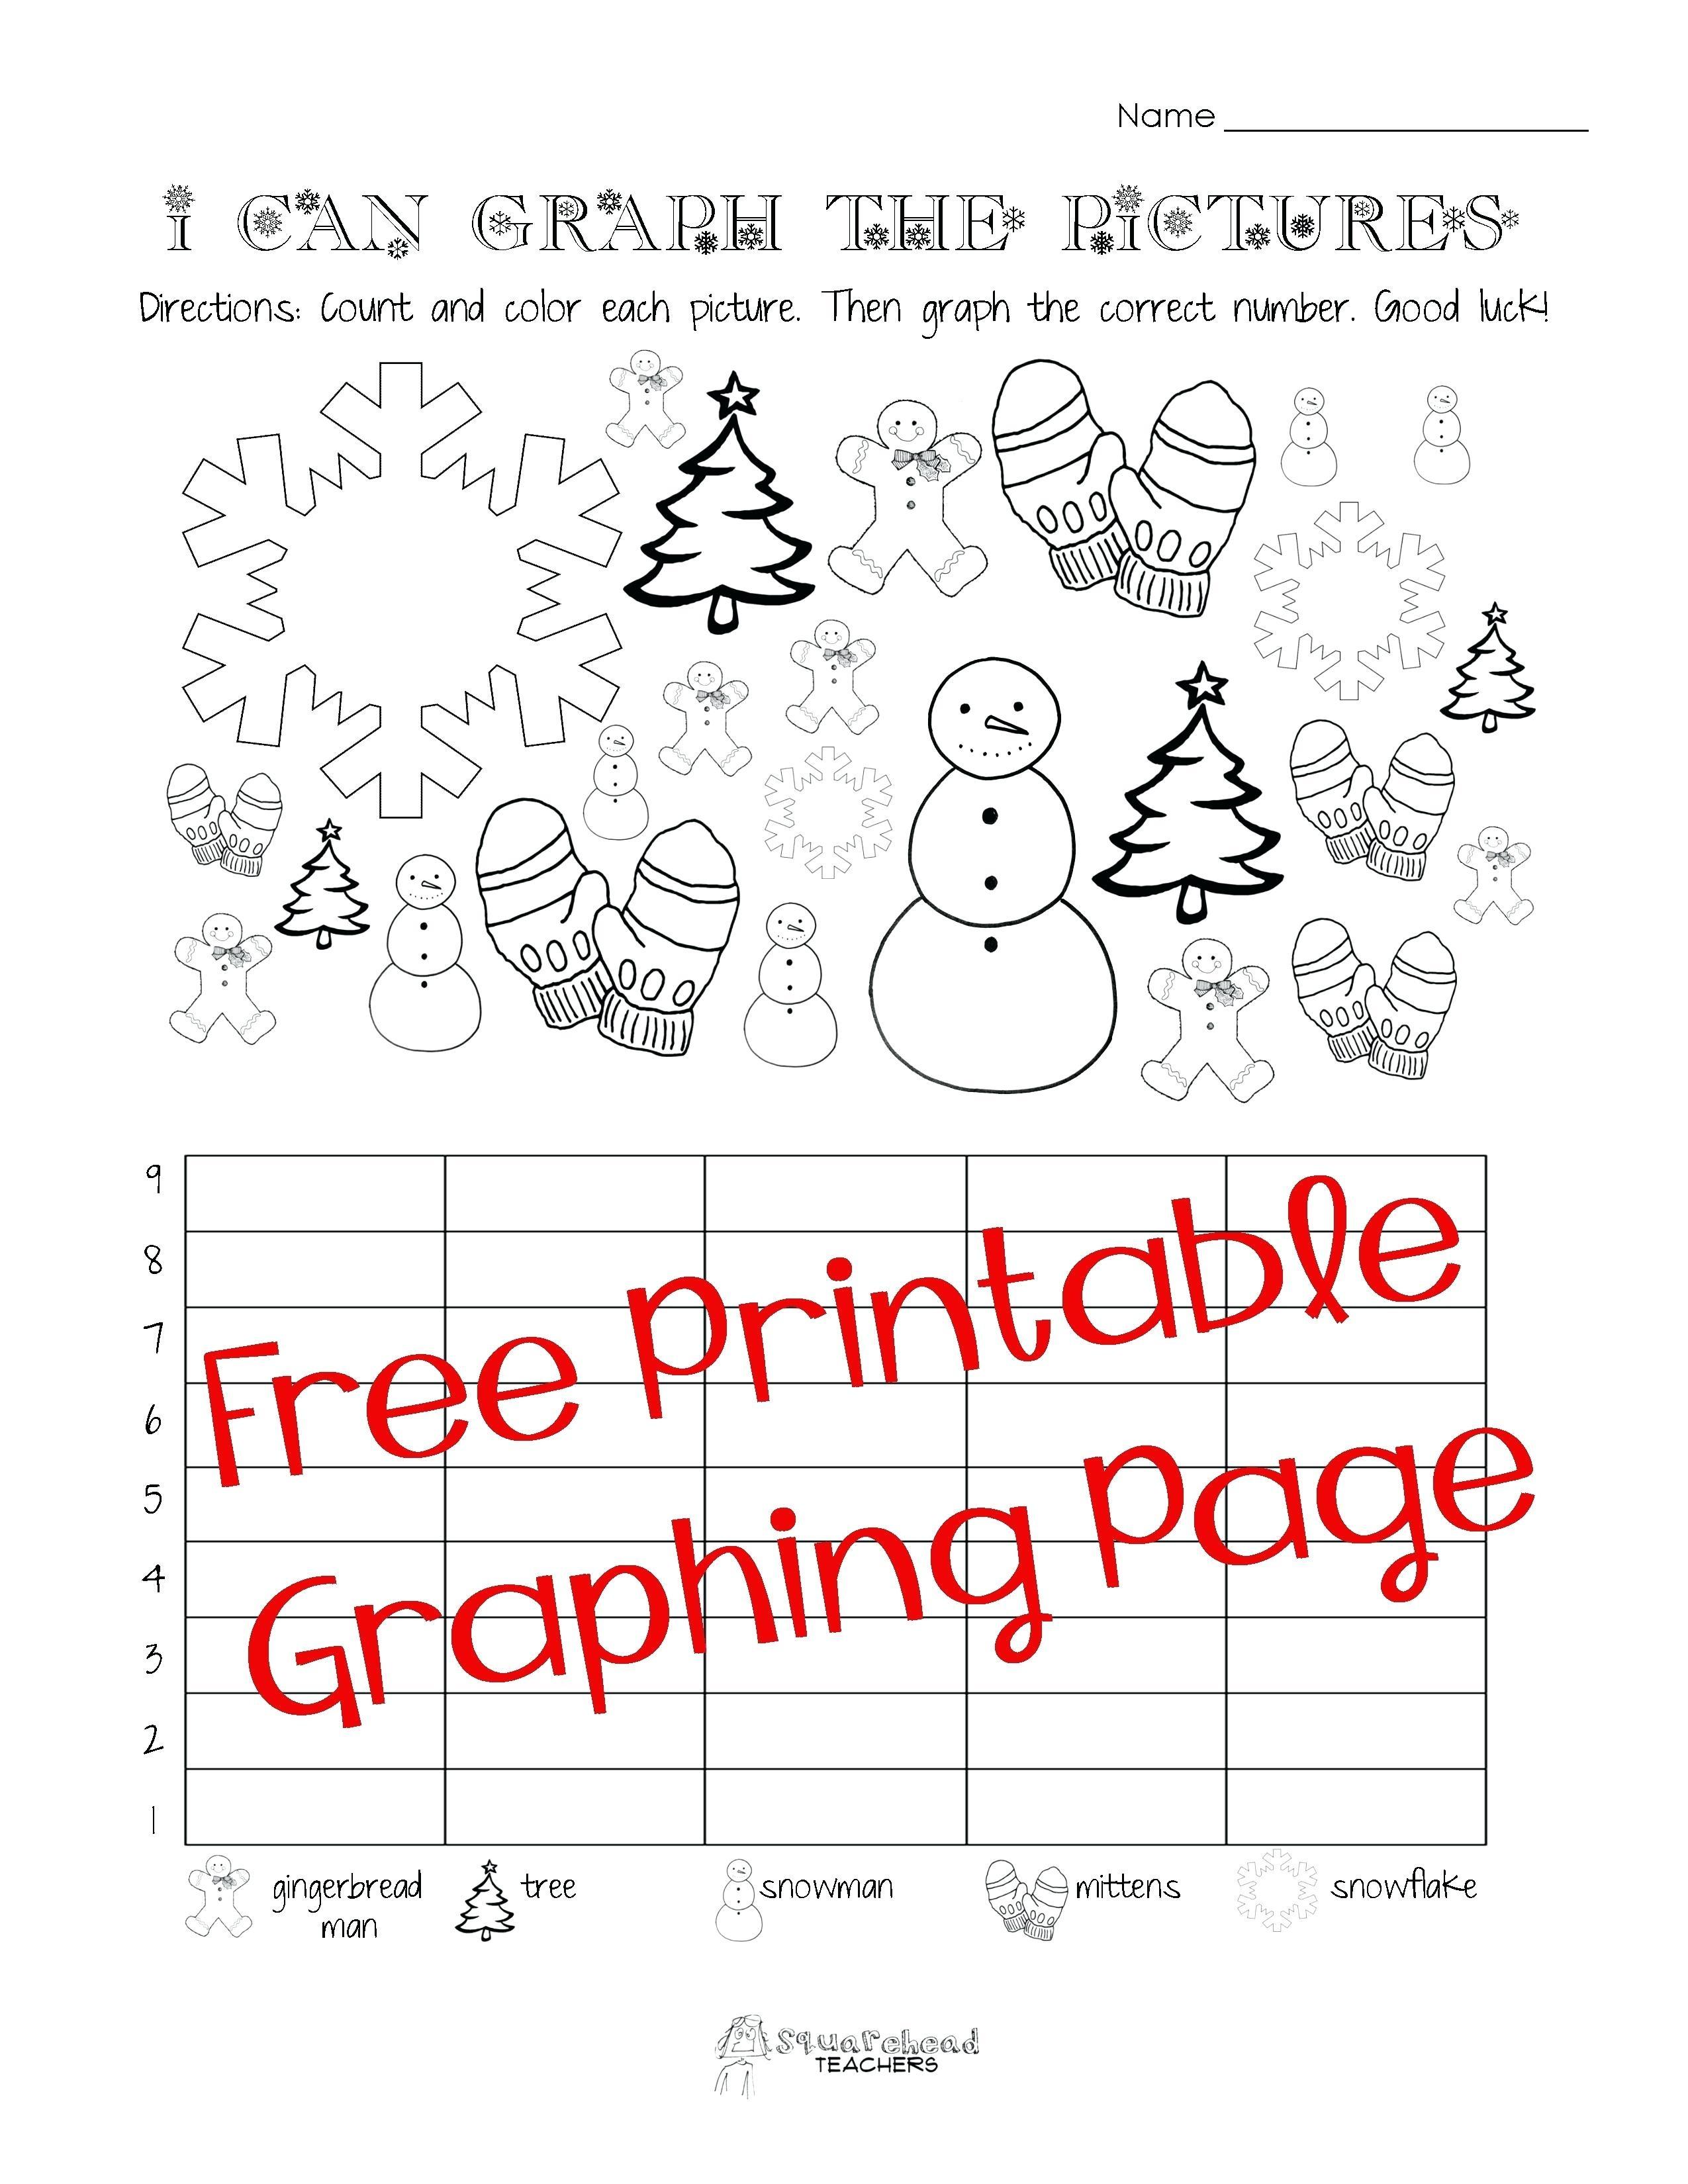 Free Printable Language Arts Worksheets For 1st Grade